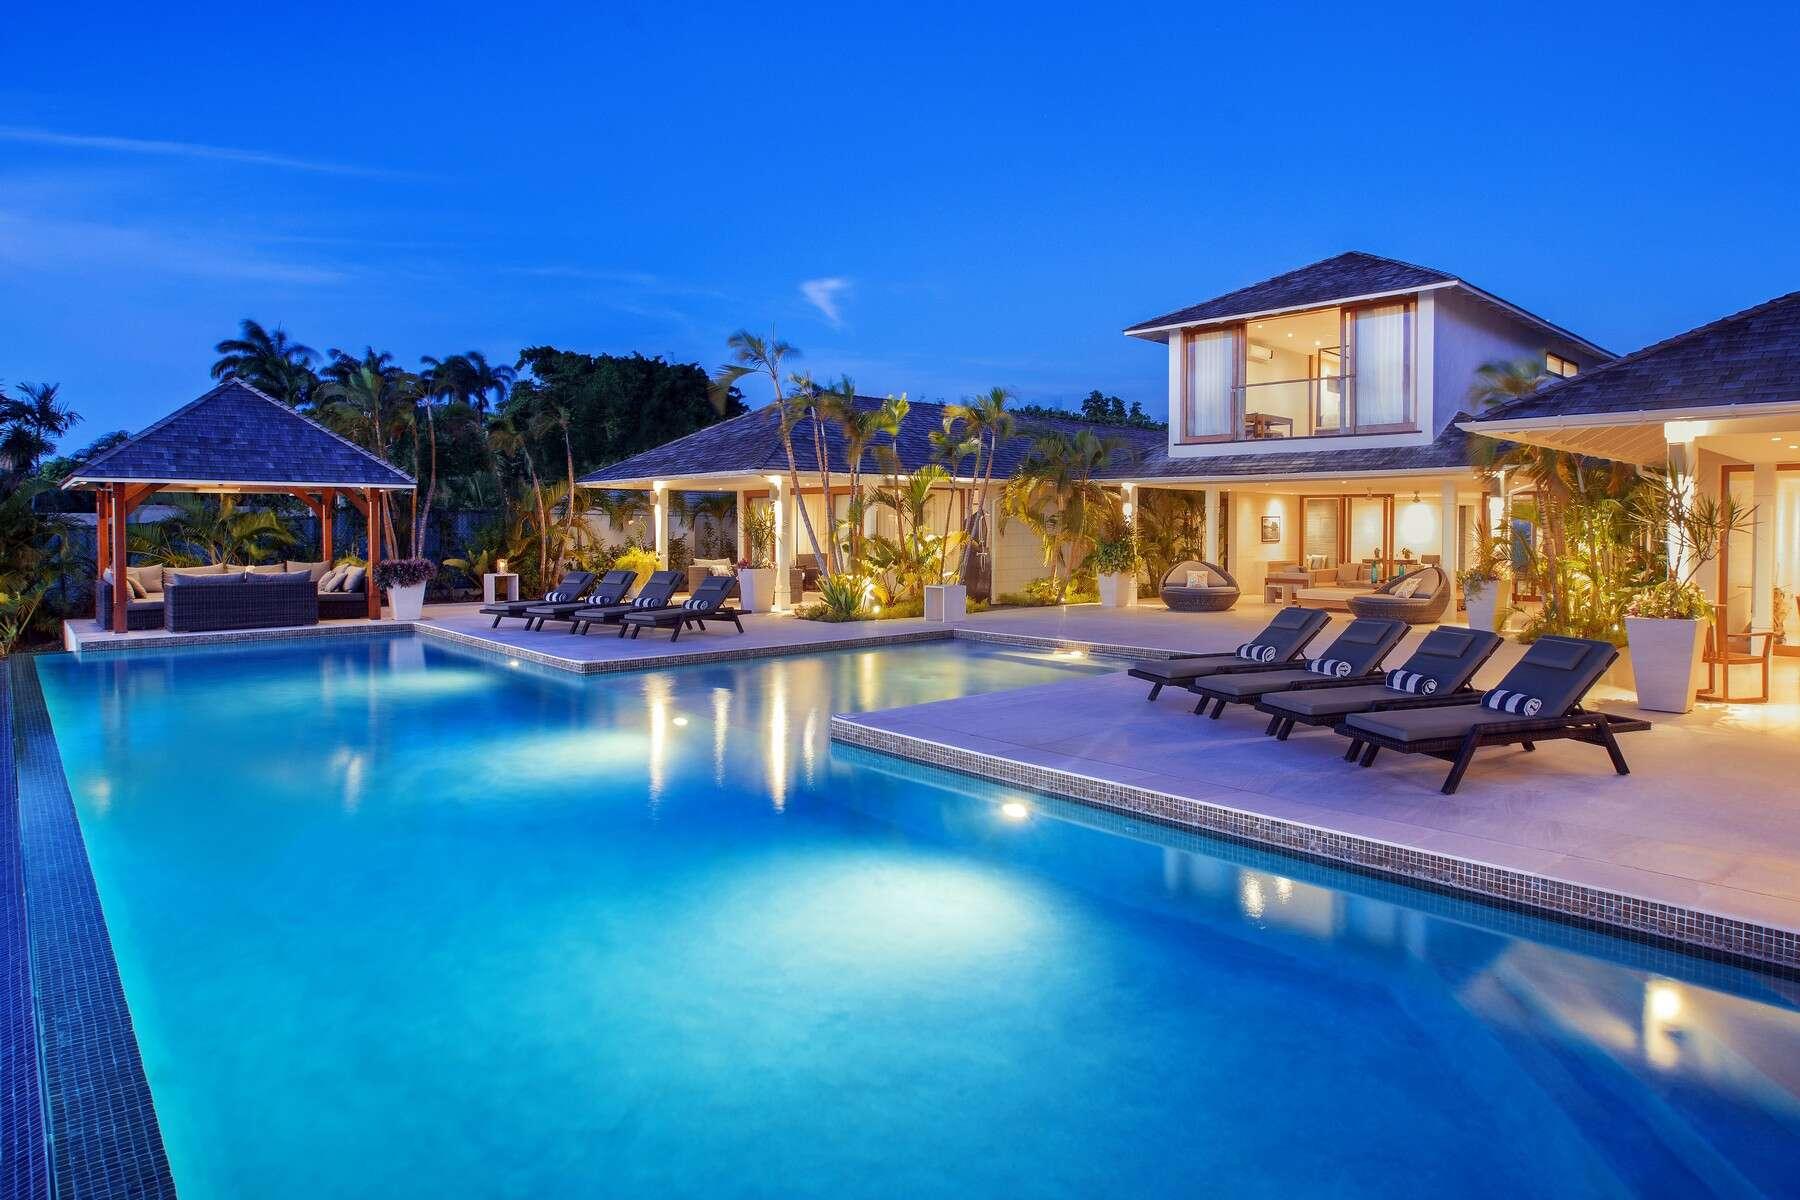 Luxury villa rentals caribbean - Barbados - St peter - Coral cliffridge - Elysium - Image 1/15